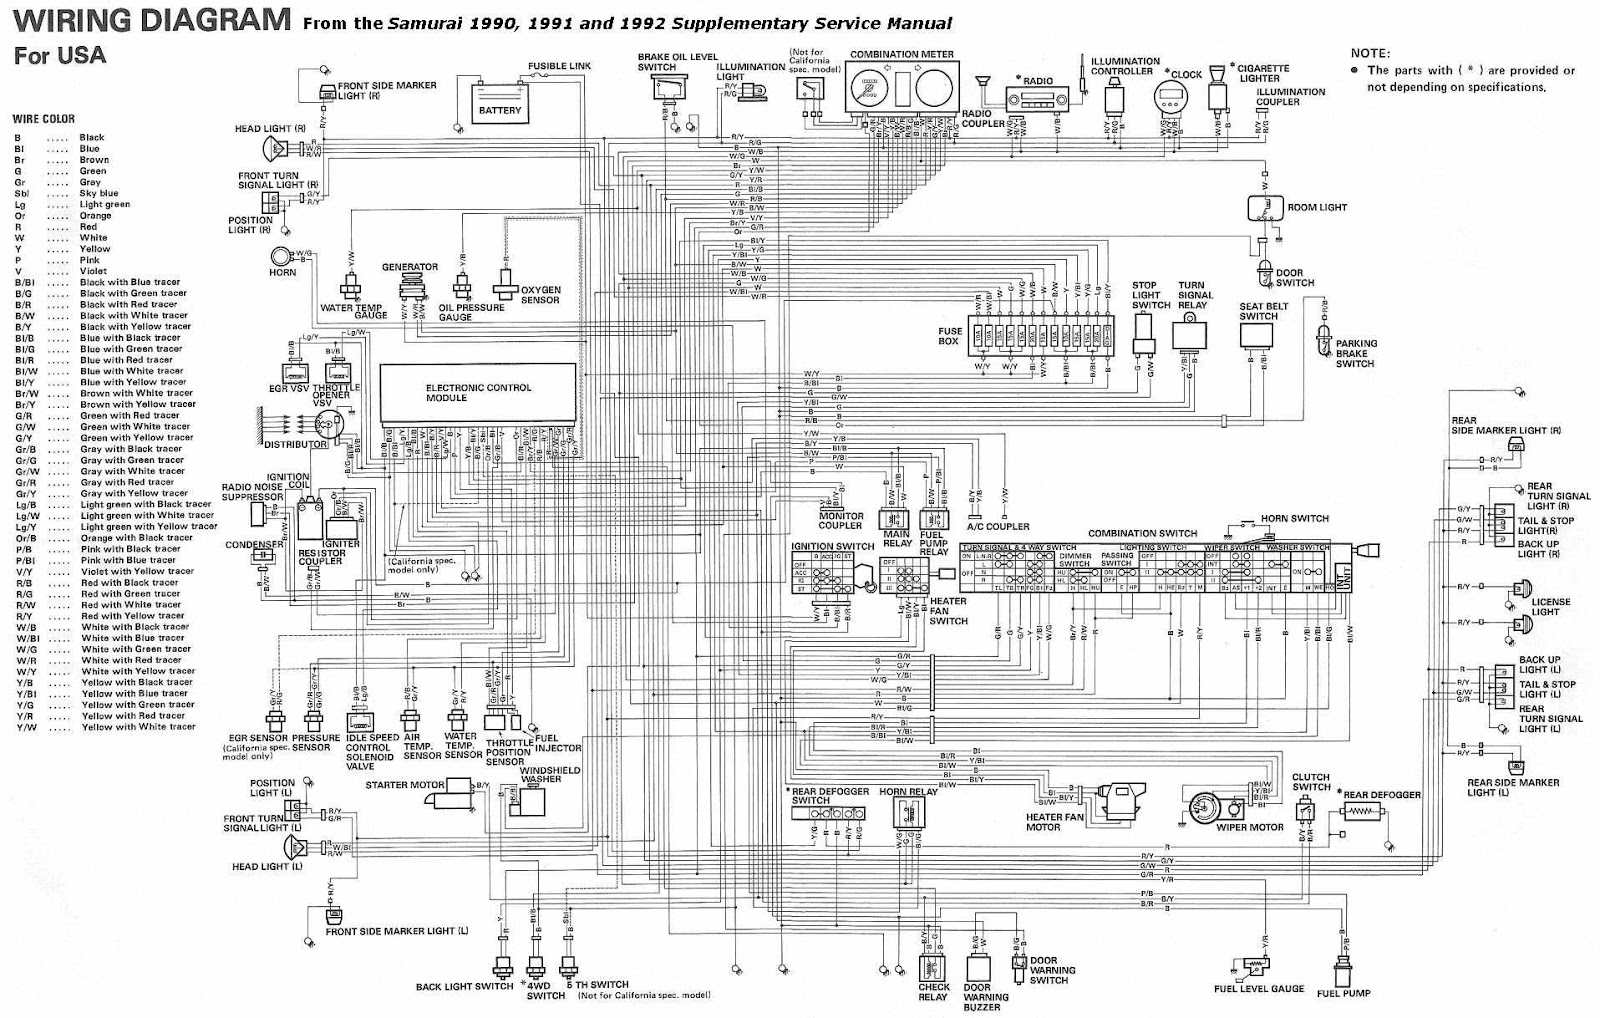 Perfect Block Diagram Symbols Ensign - Electrical System Block ...